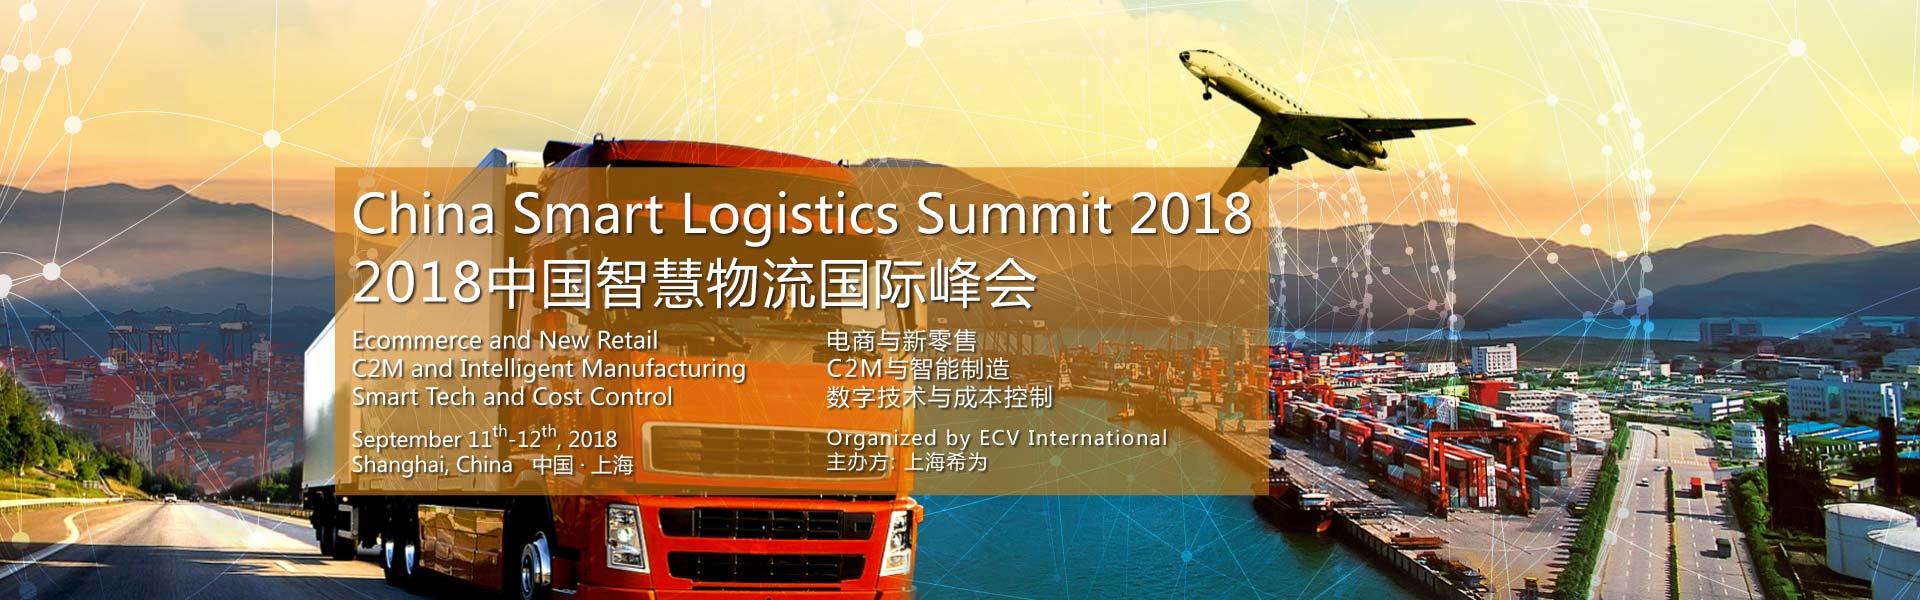 China Smart Logistics Summit 2018